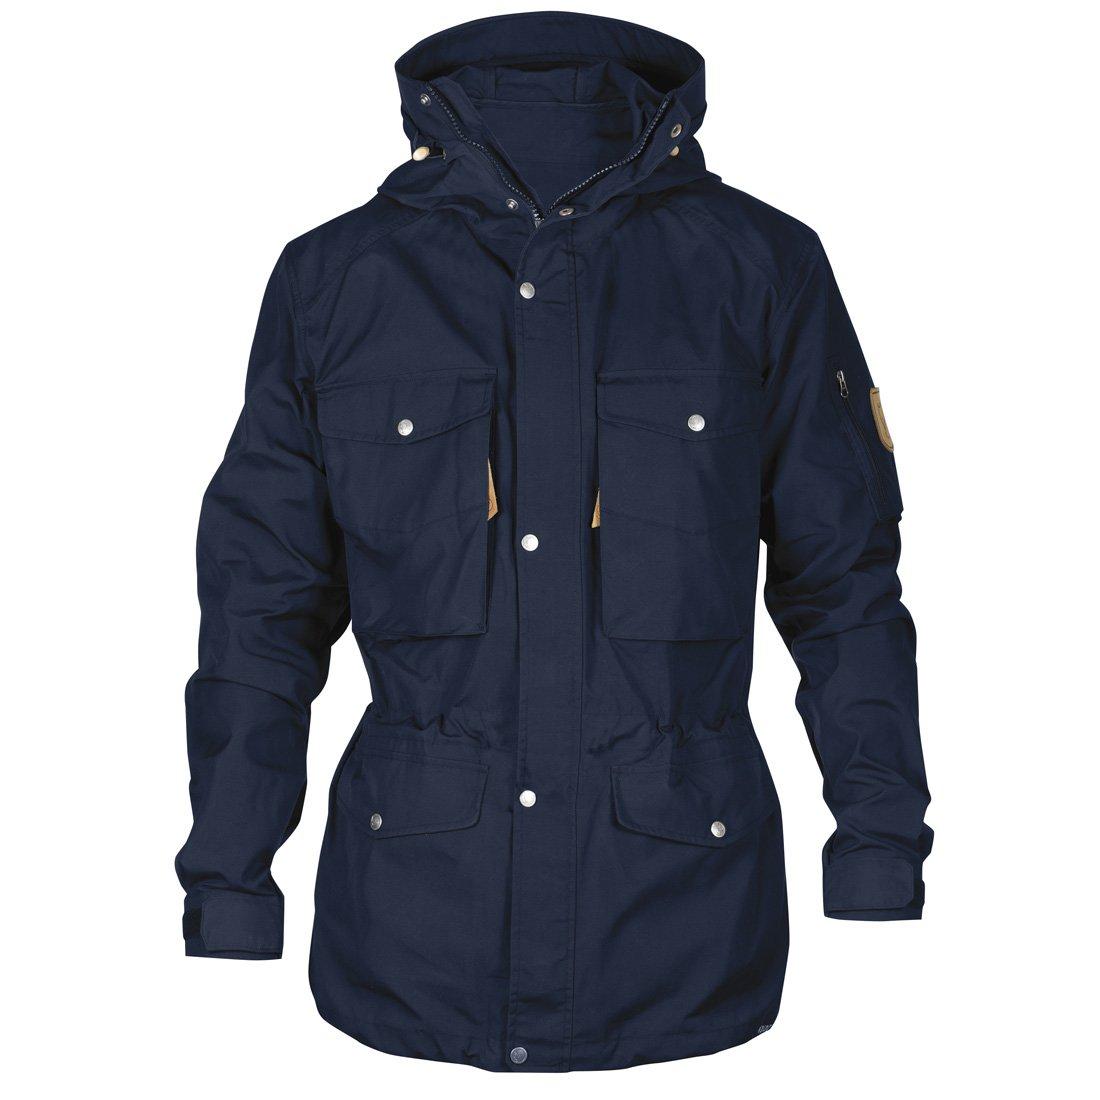 Buy fjällräven singi jacket vinterjakker . Shop every store